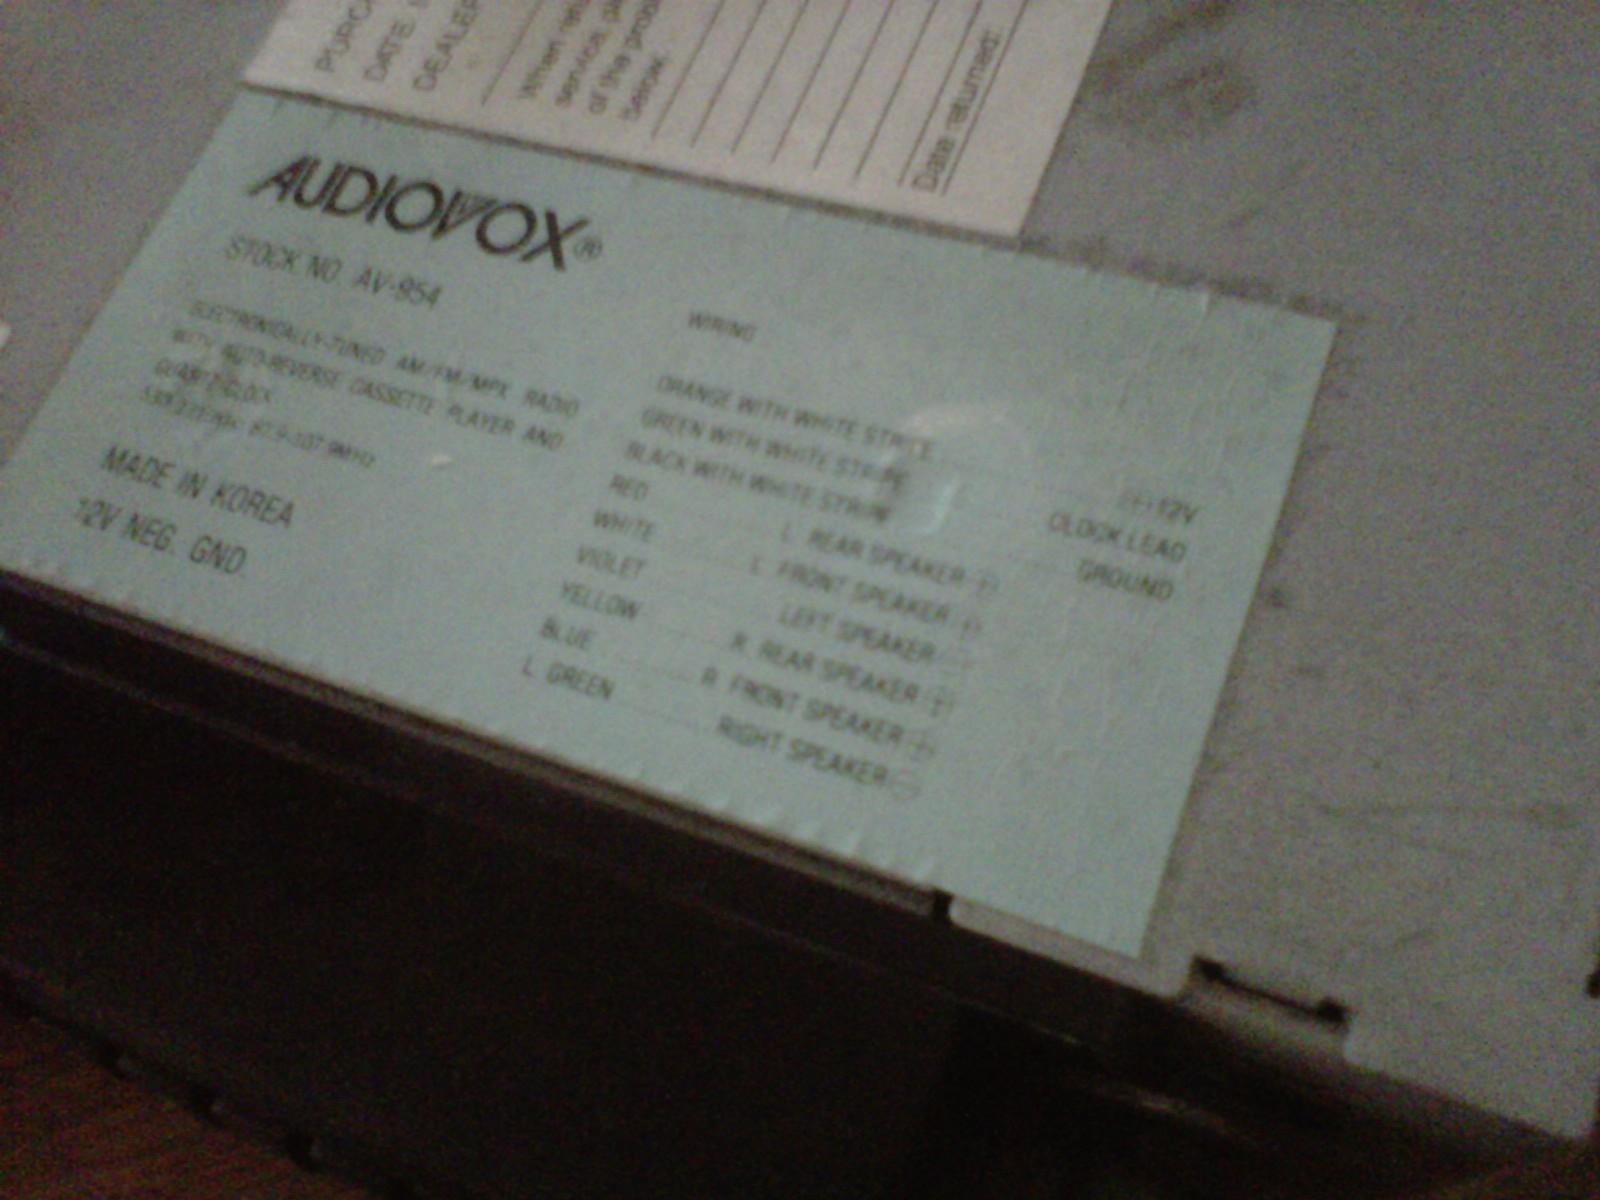 audiovox 2 way radio manual